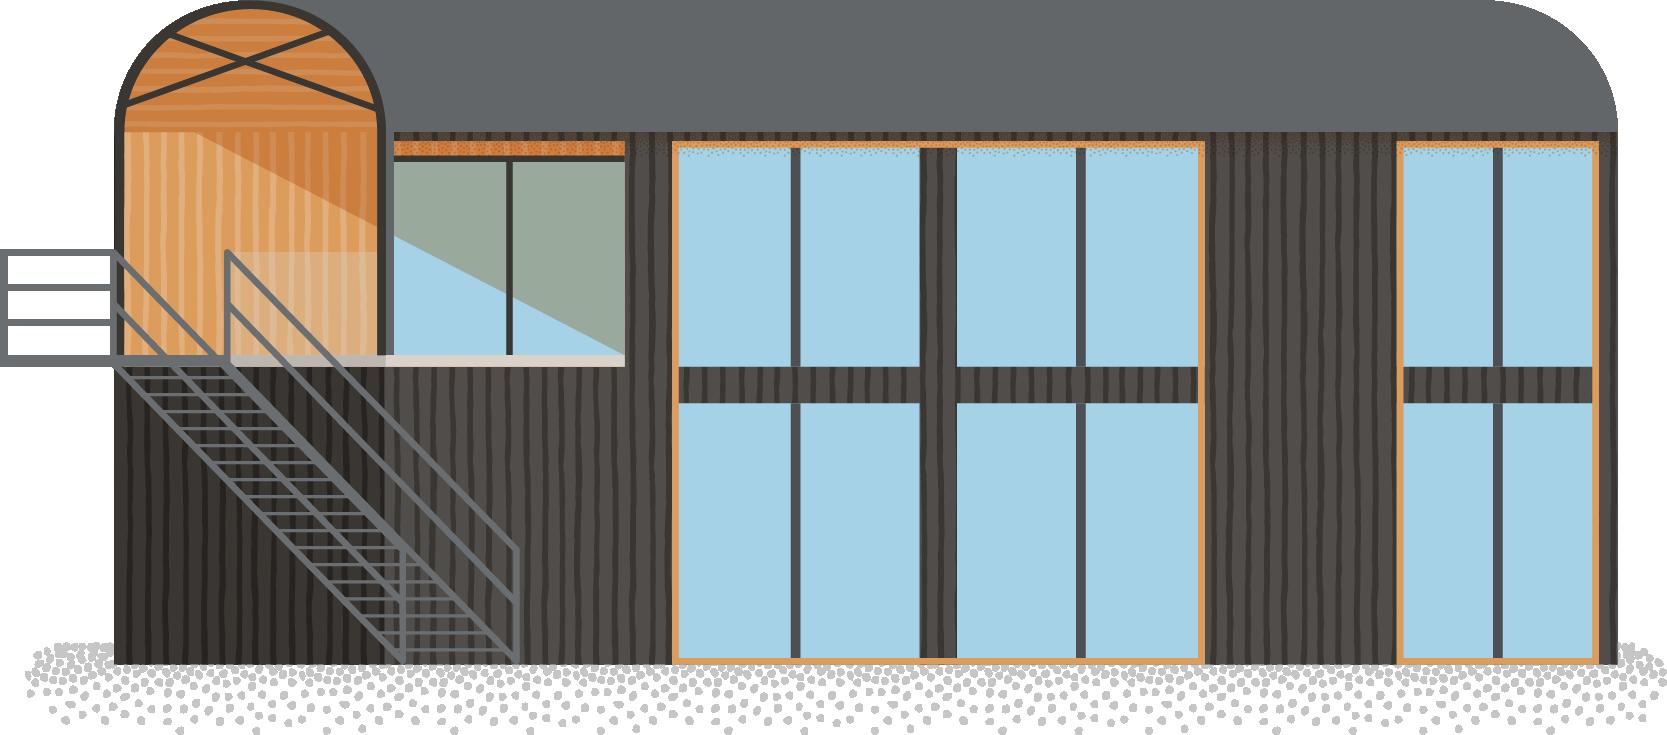 Mill Farm Barns (Orme Architects) - Glastonbury - Card